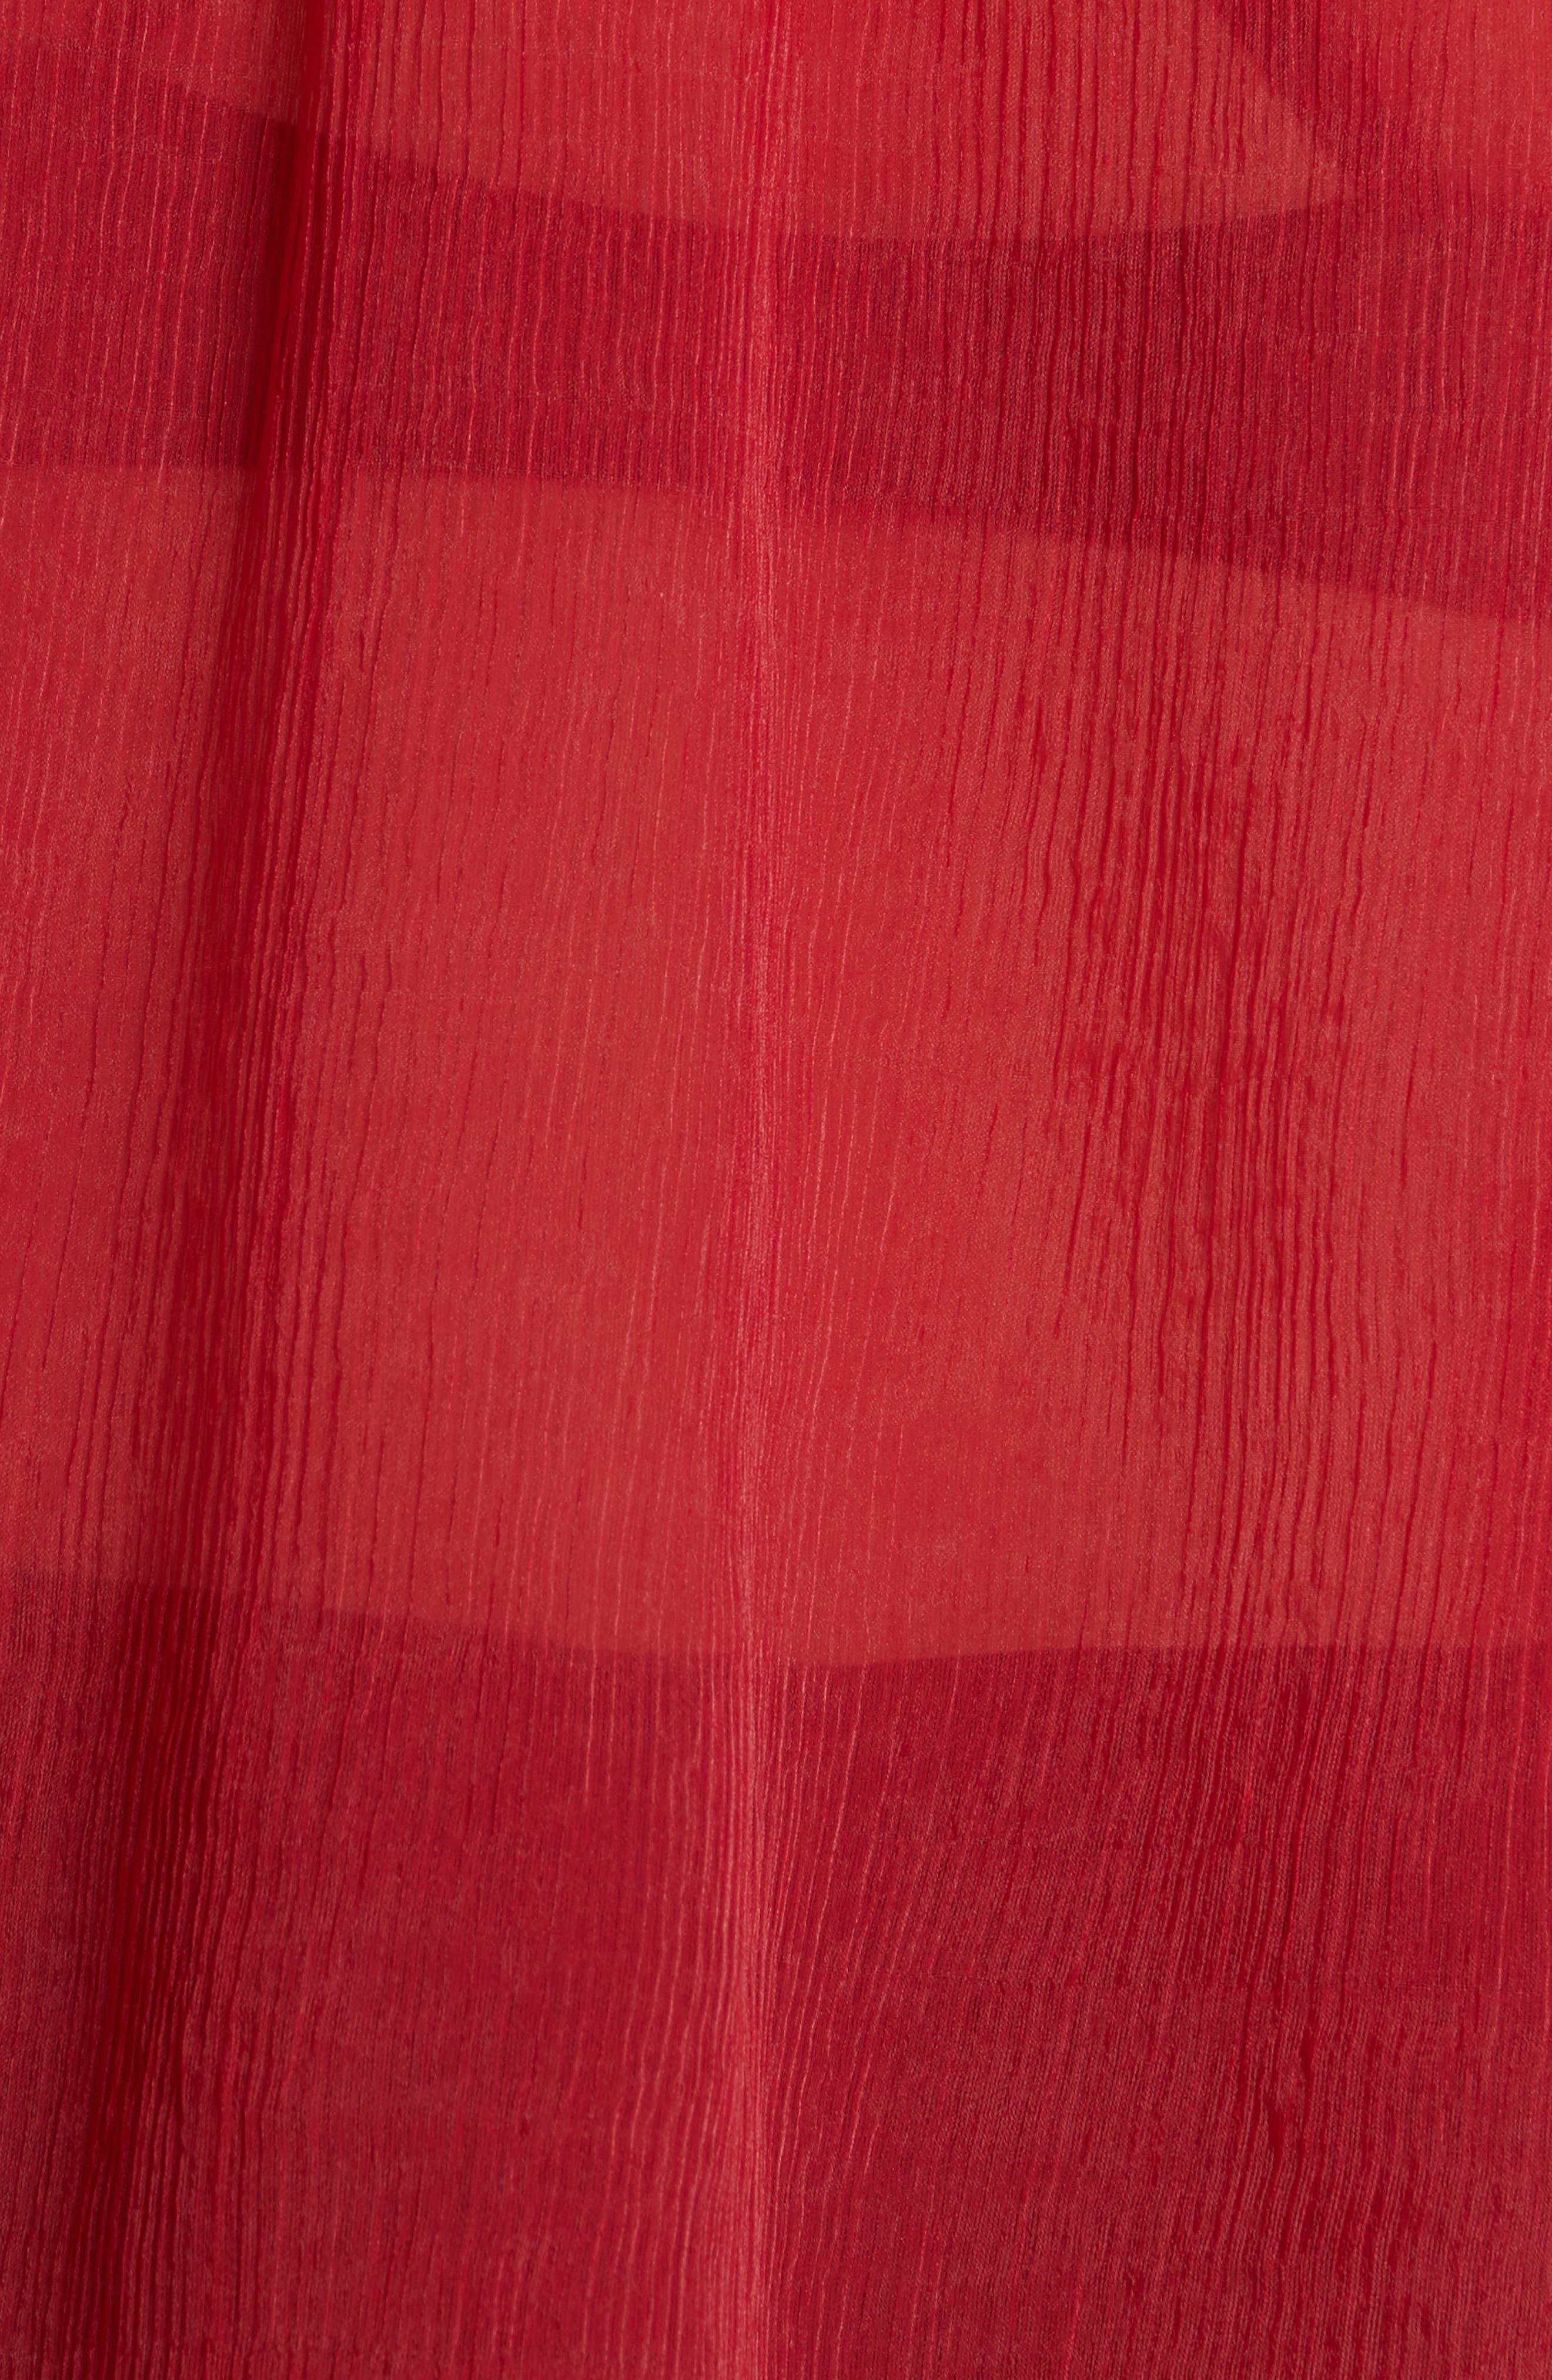 Camarina Crinkle Chiffon Blouse,                             Alternate thumbnail 5, color,                             620